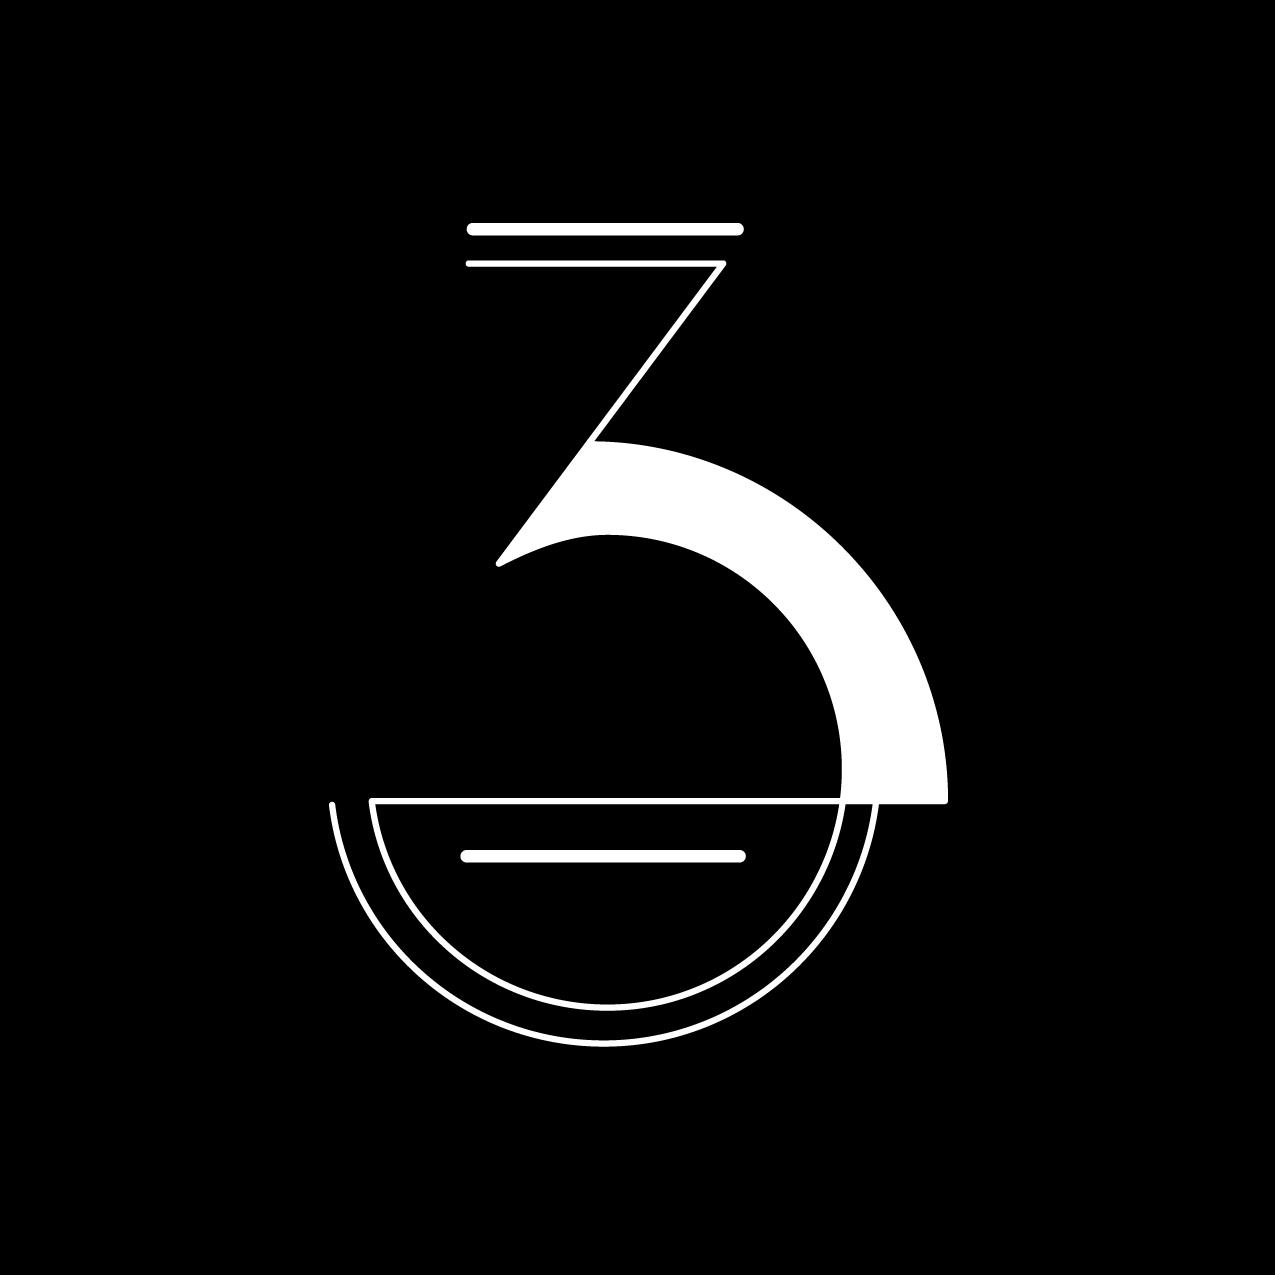 Letter Z6 Design by Furia